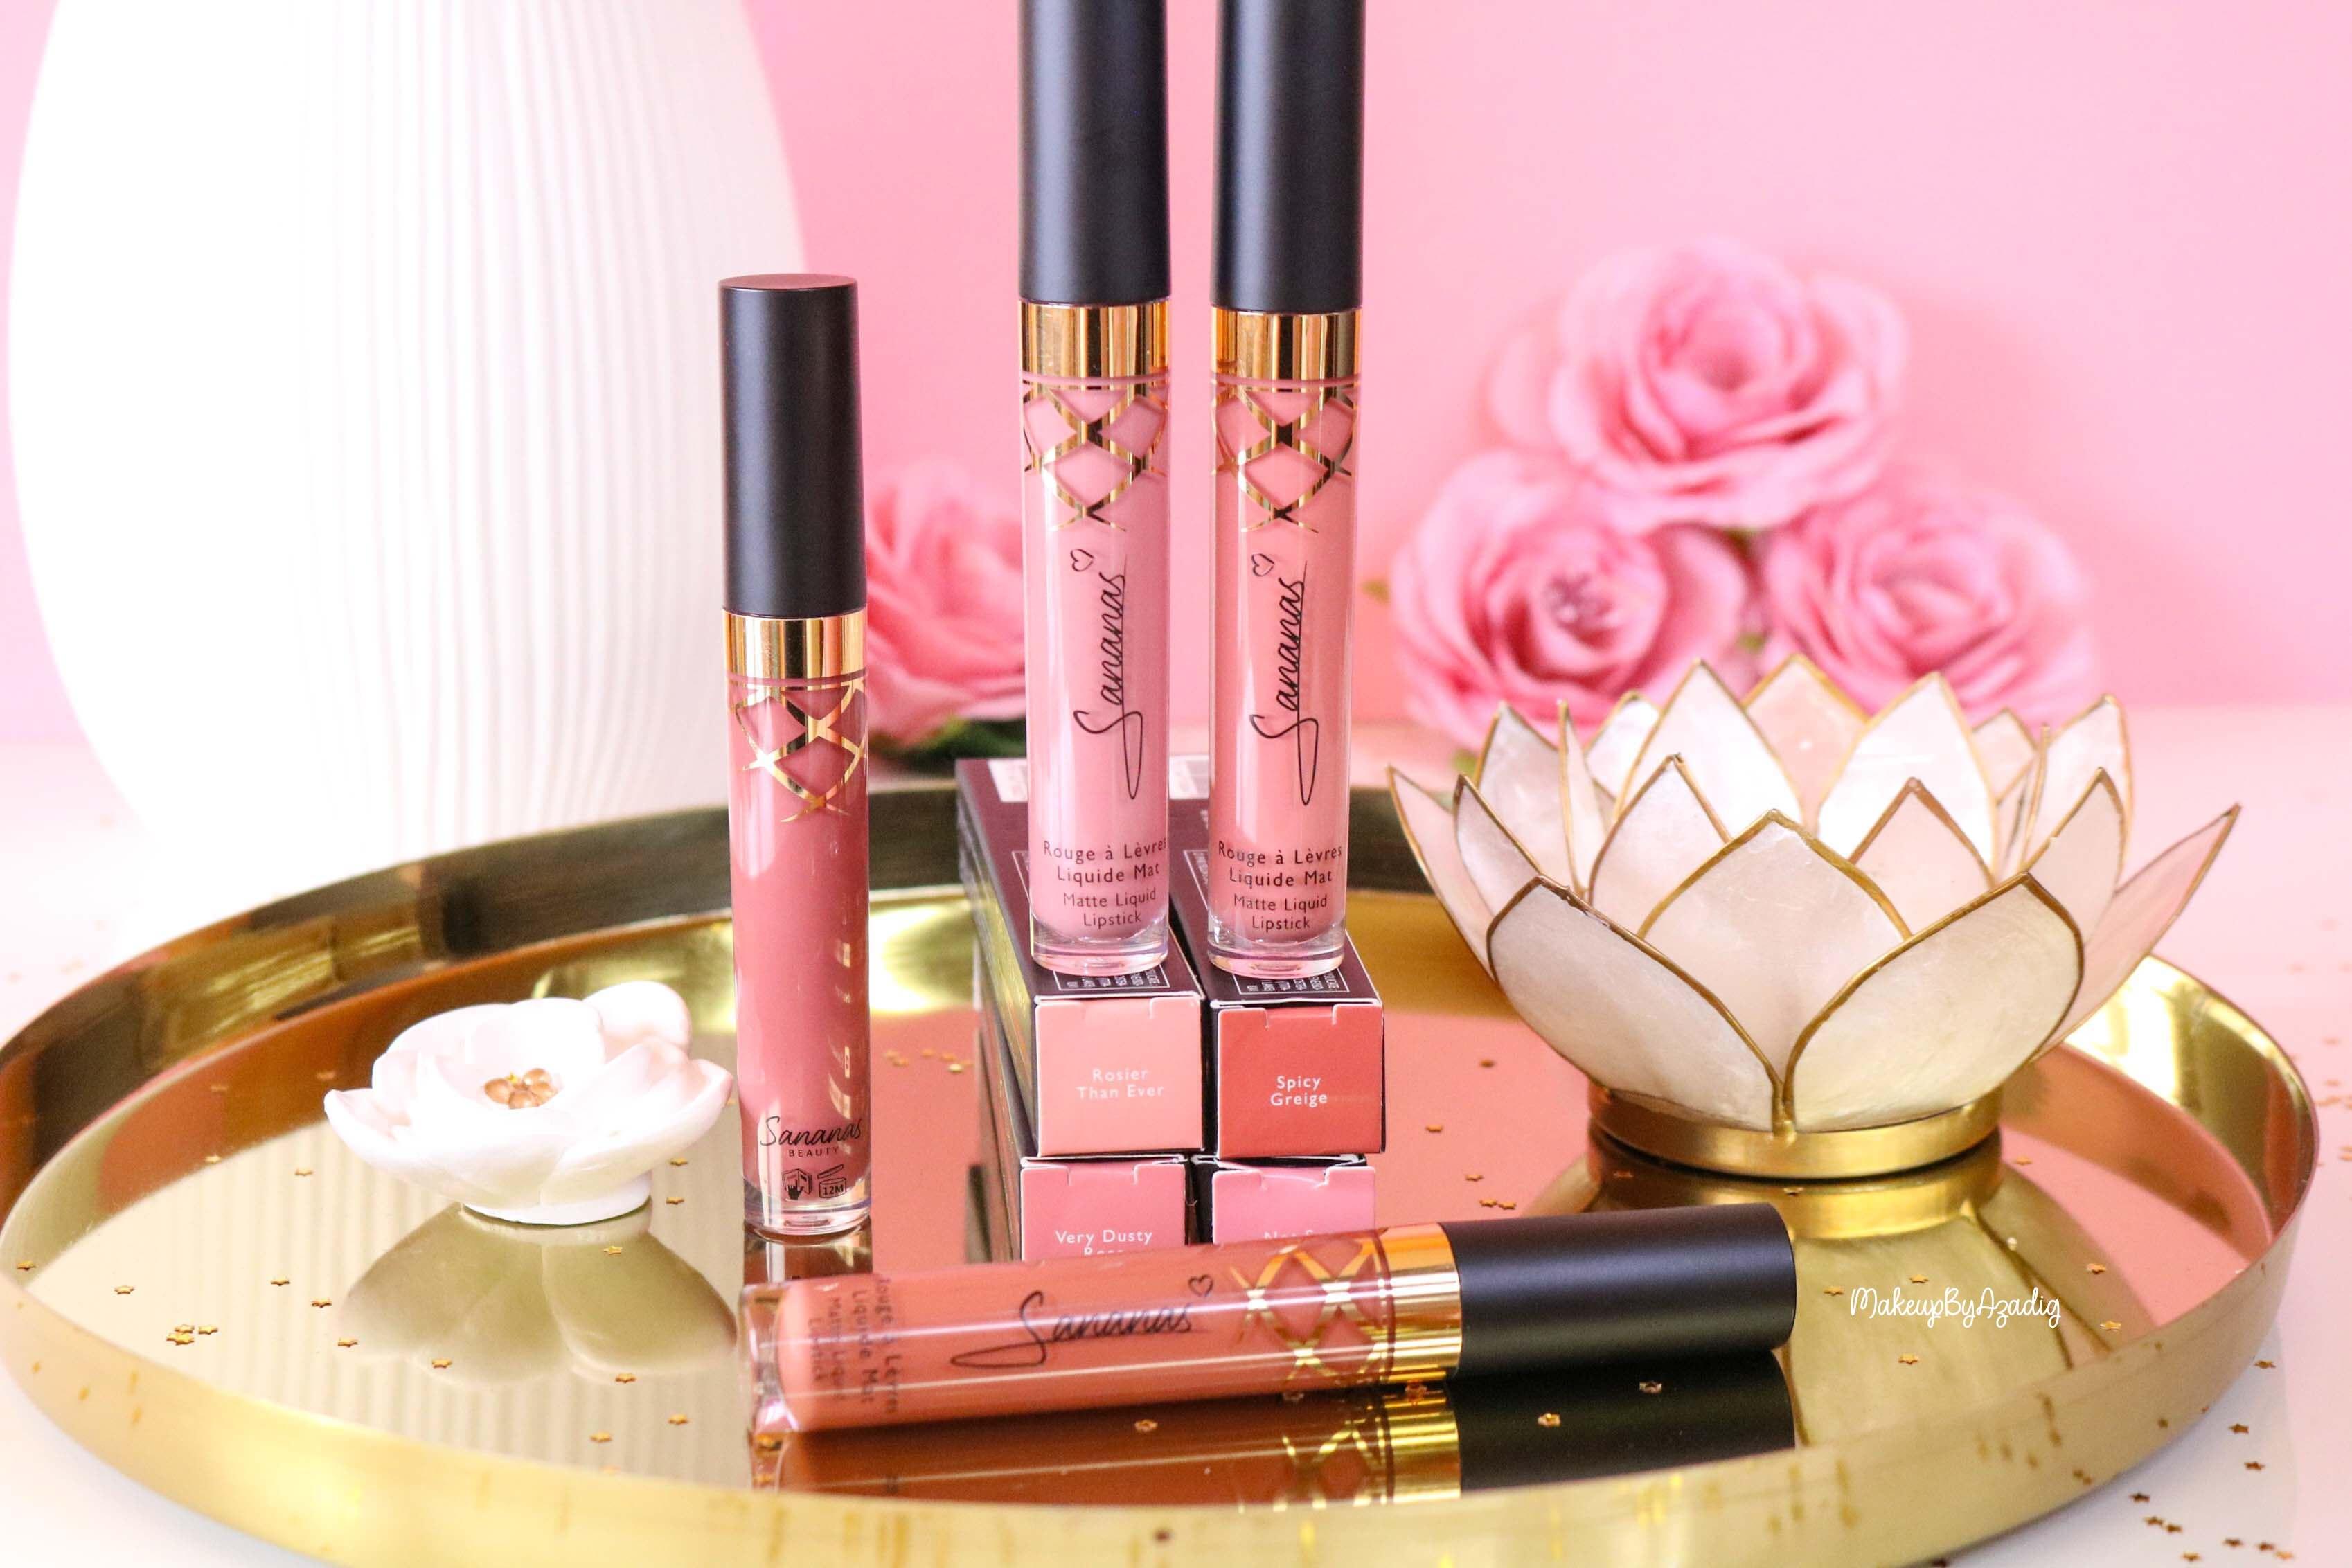 revue-marque-sananas-beauty-rouge-a-levres-vernis-kit-avis-prix-amazon-makeupbyazadig-dusty-pink-greige-rosier-instagram